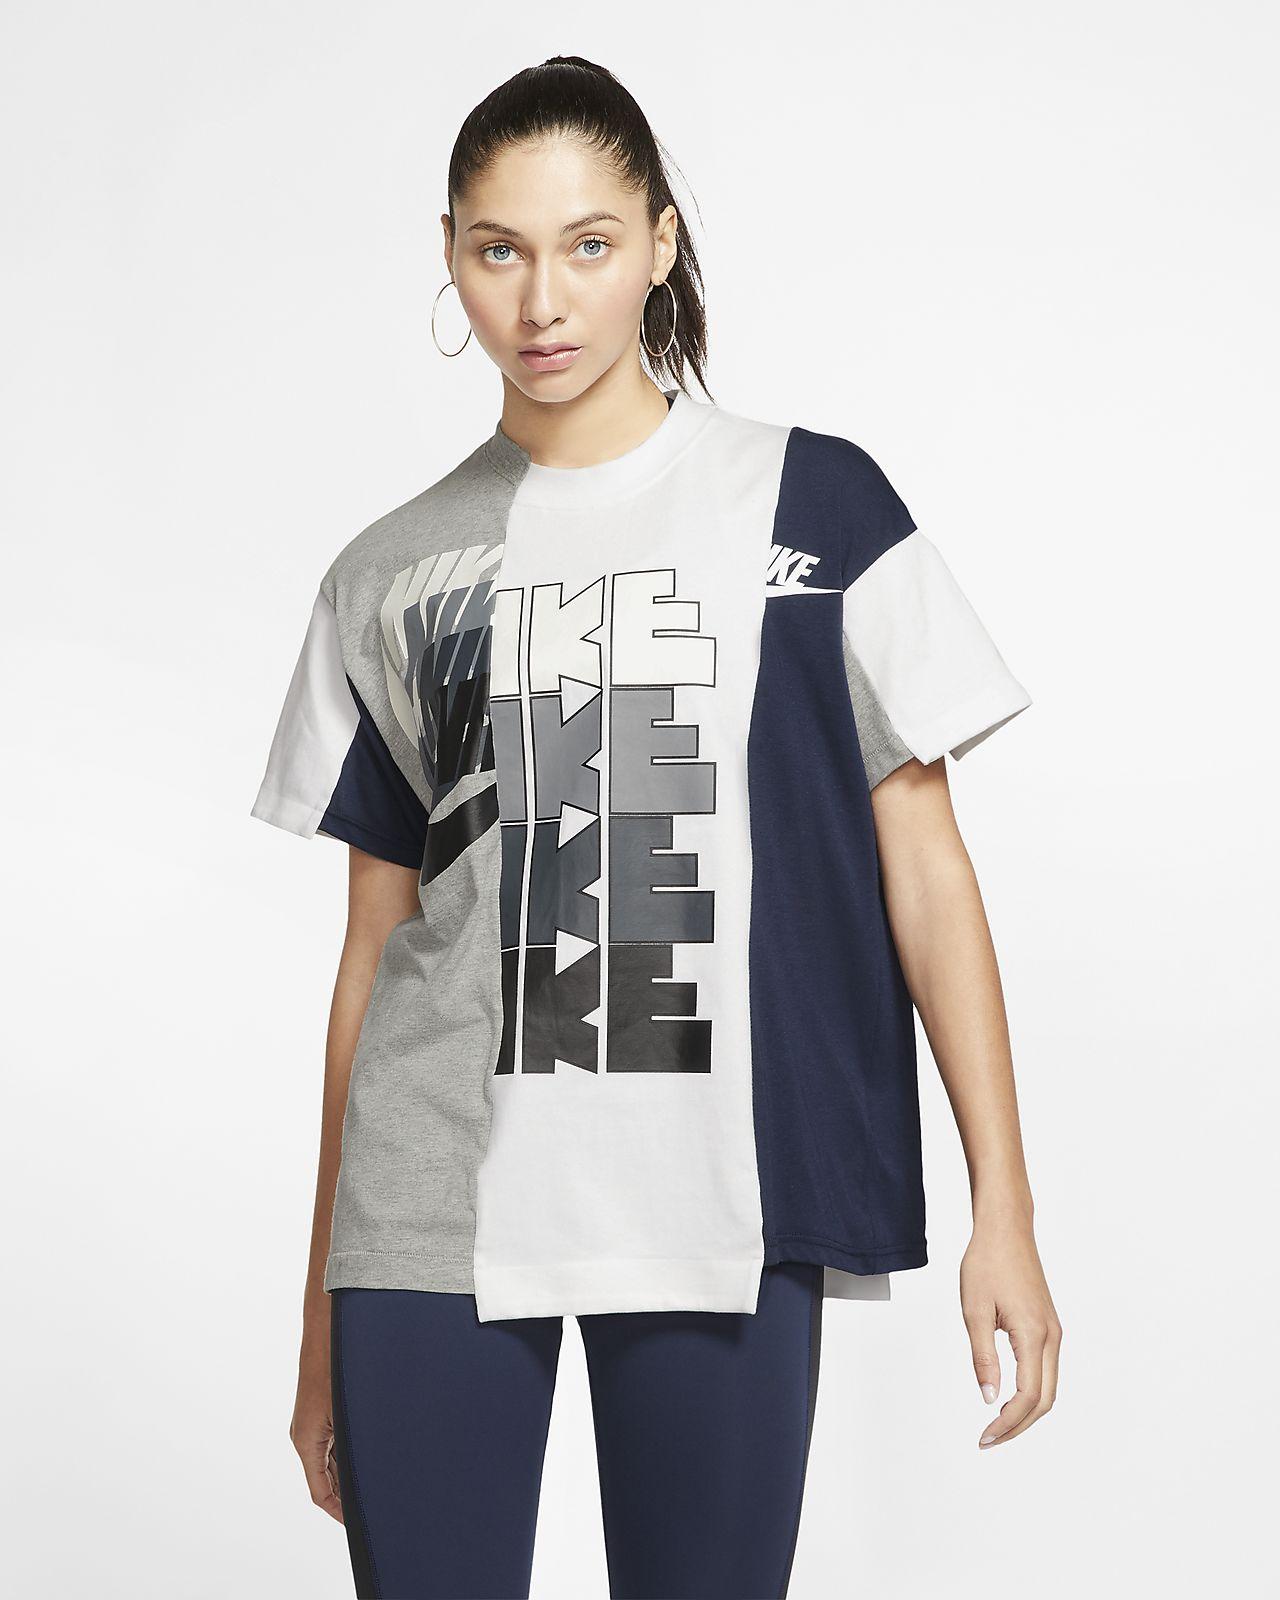 Nike x Sacai női hibrid póló